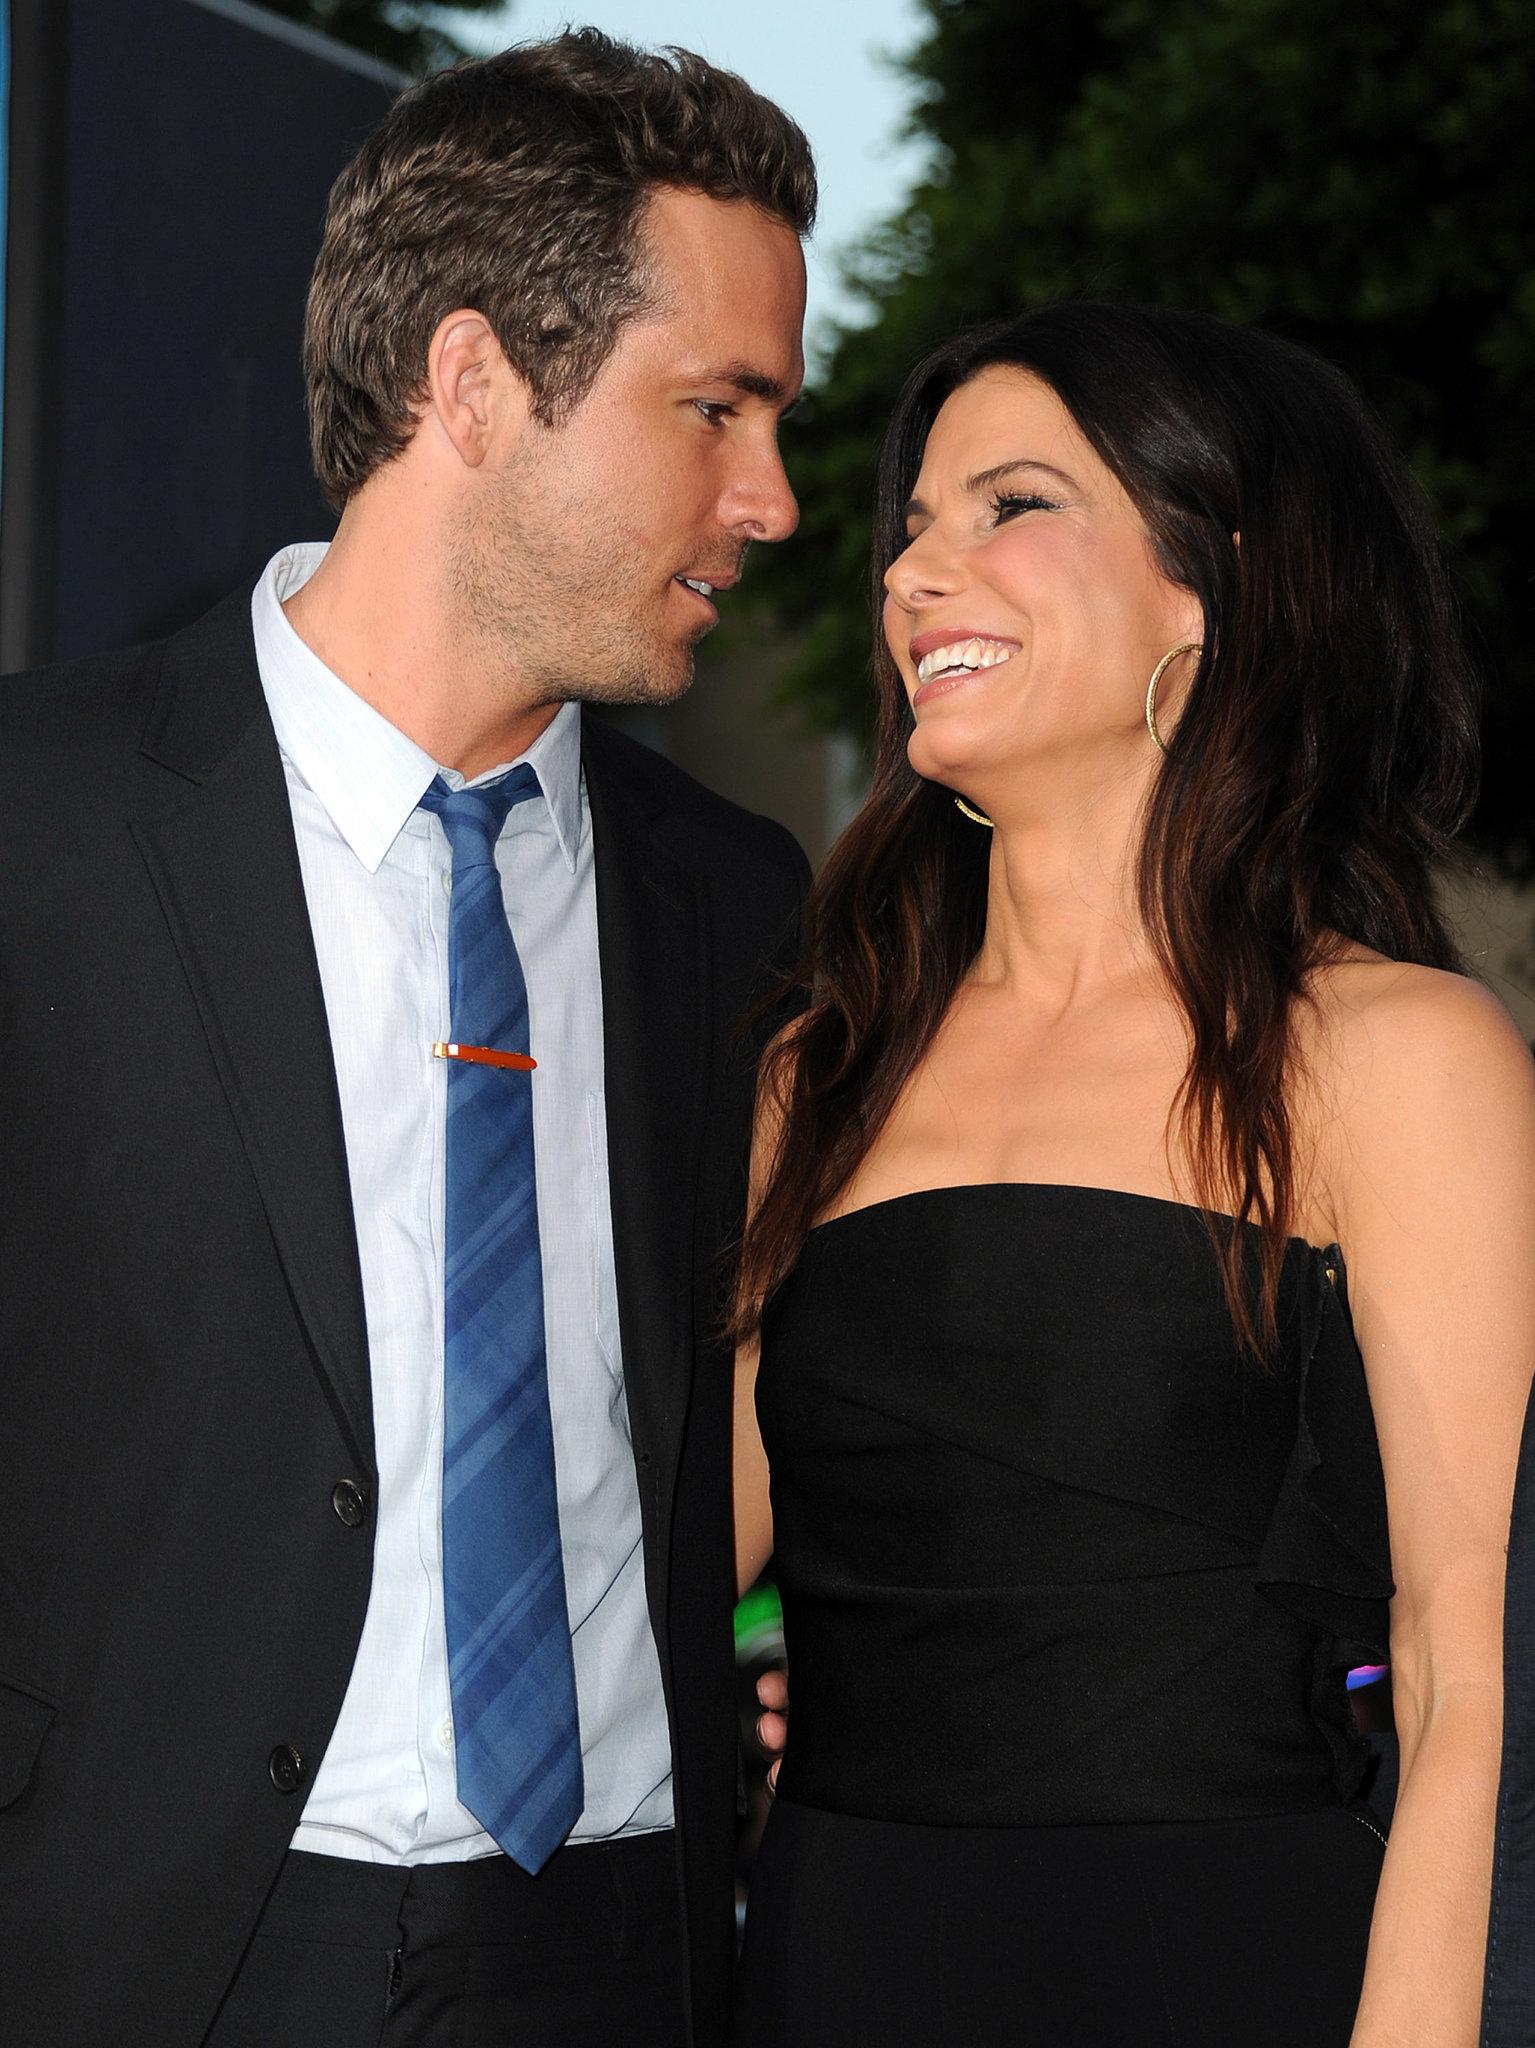 Ryan Reynolds and Sandra Bullock